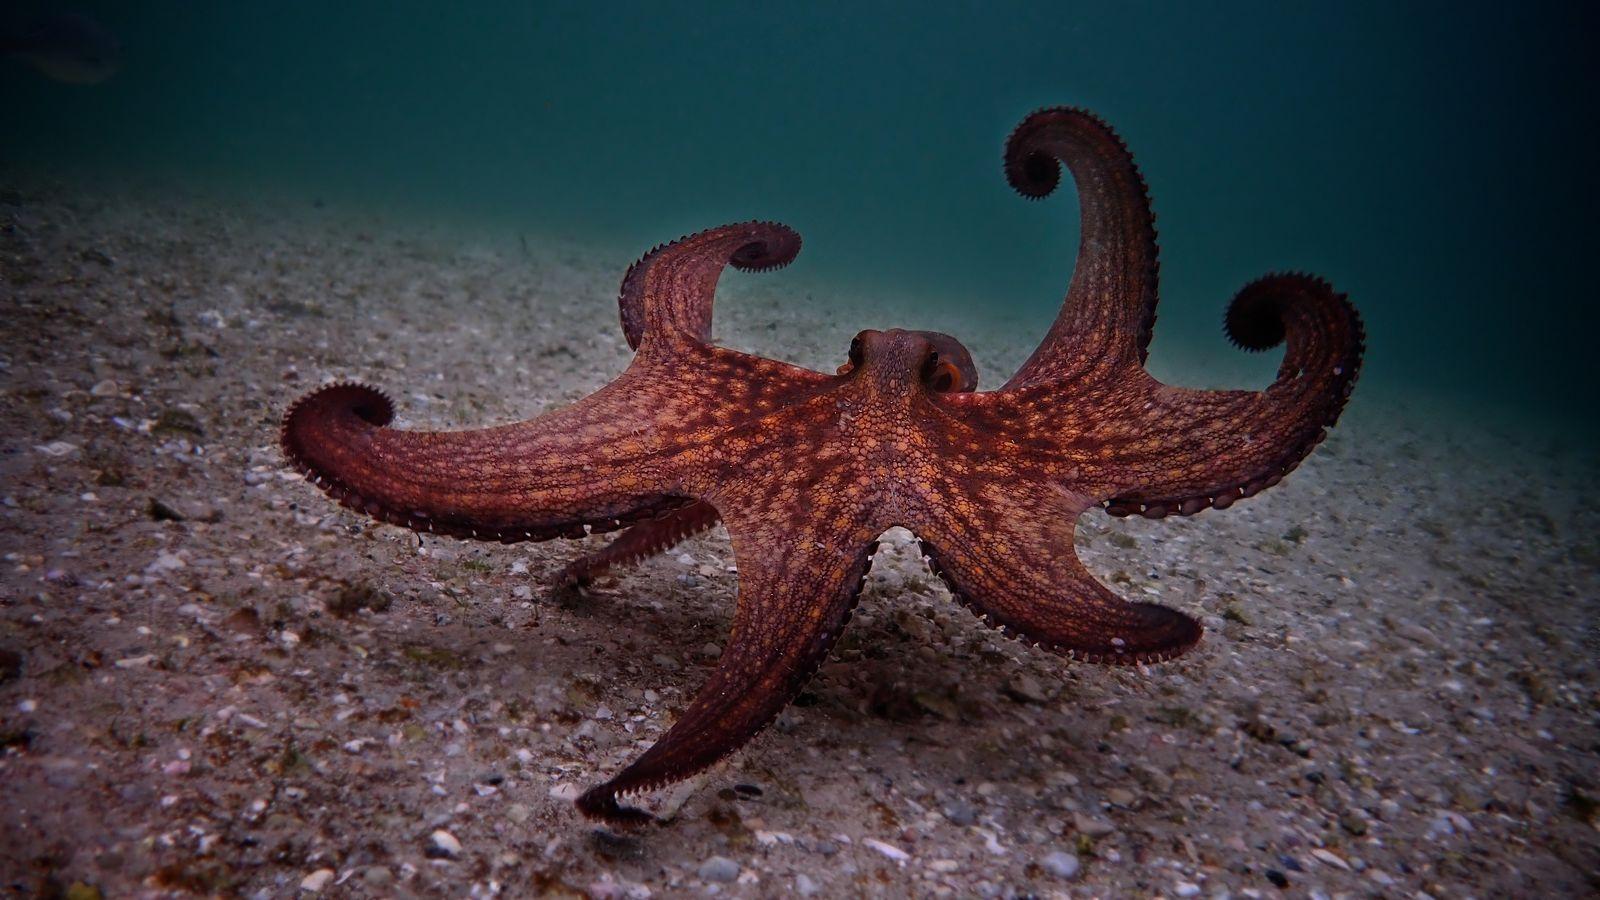 My Octopus Teacher release date